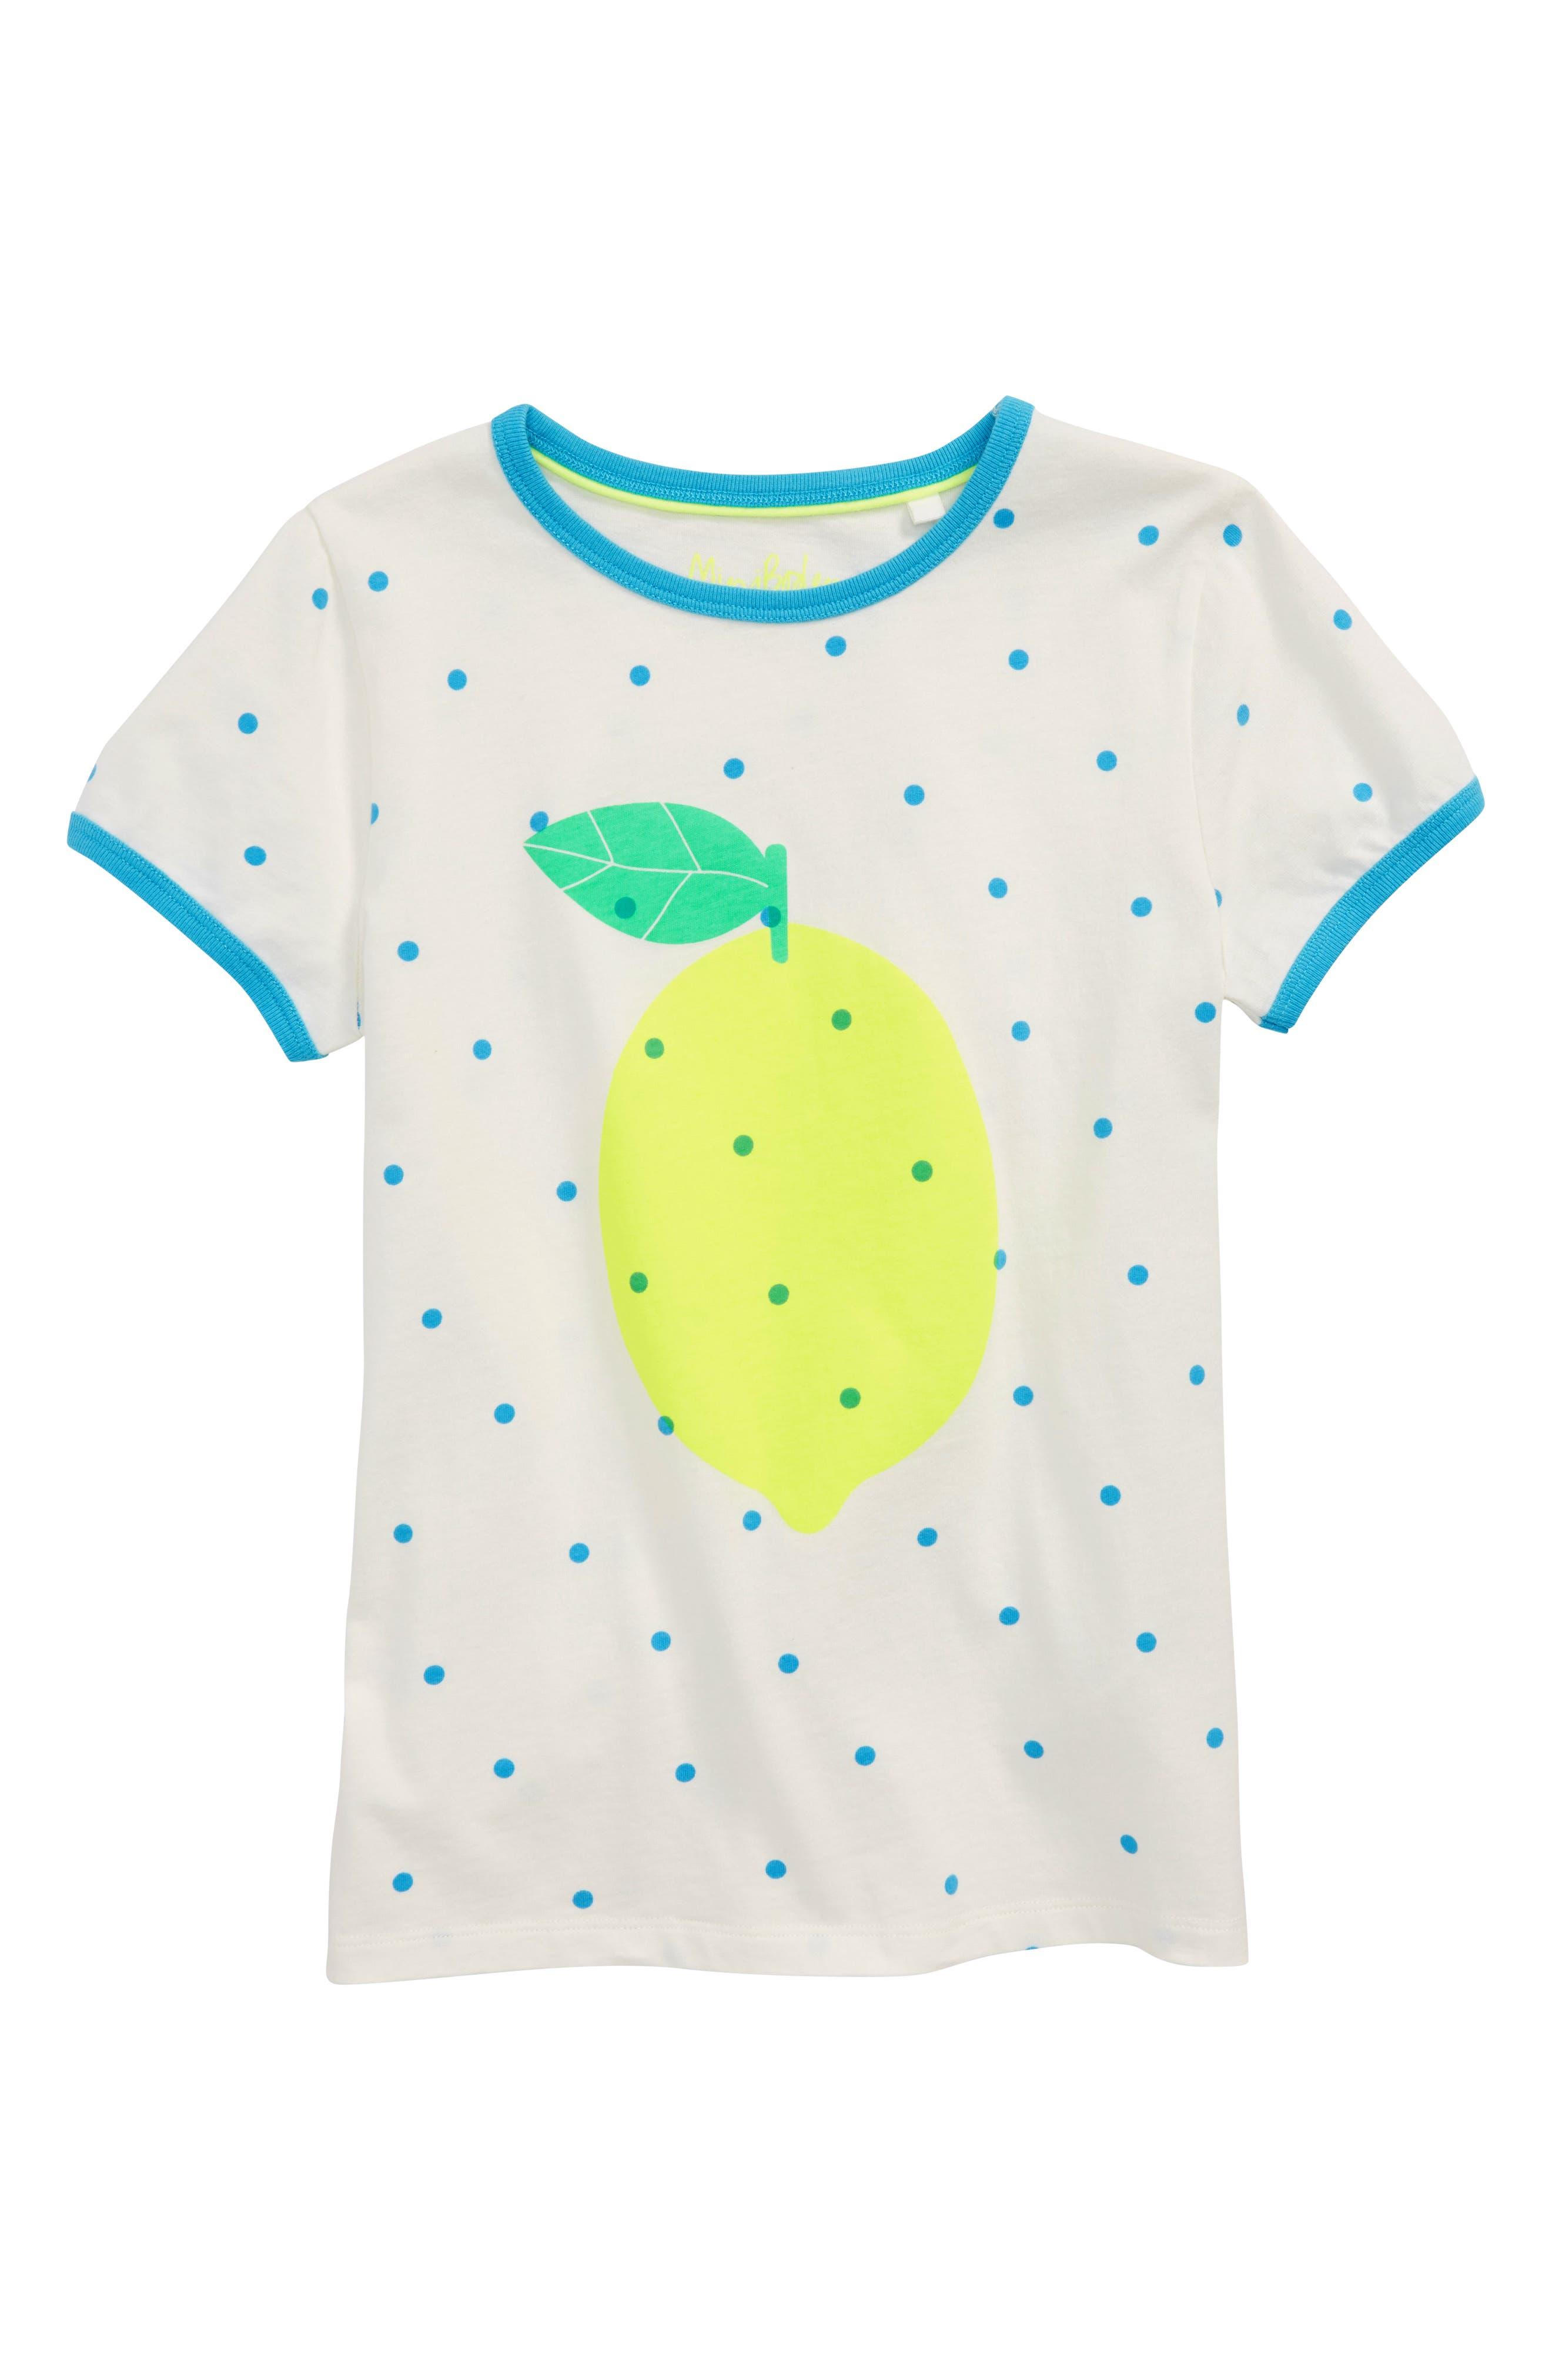 Bright Lemon Tee,                         Main,                         color, Ivory/ Sail Confetti Spot Ivo